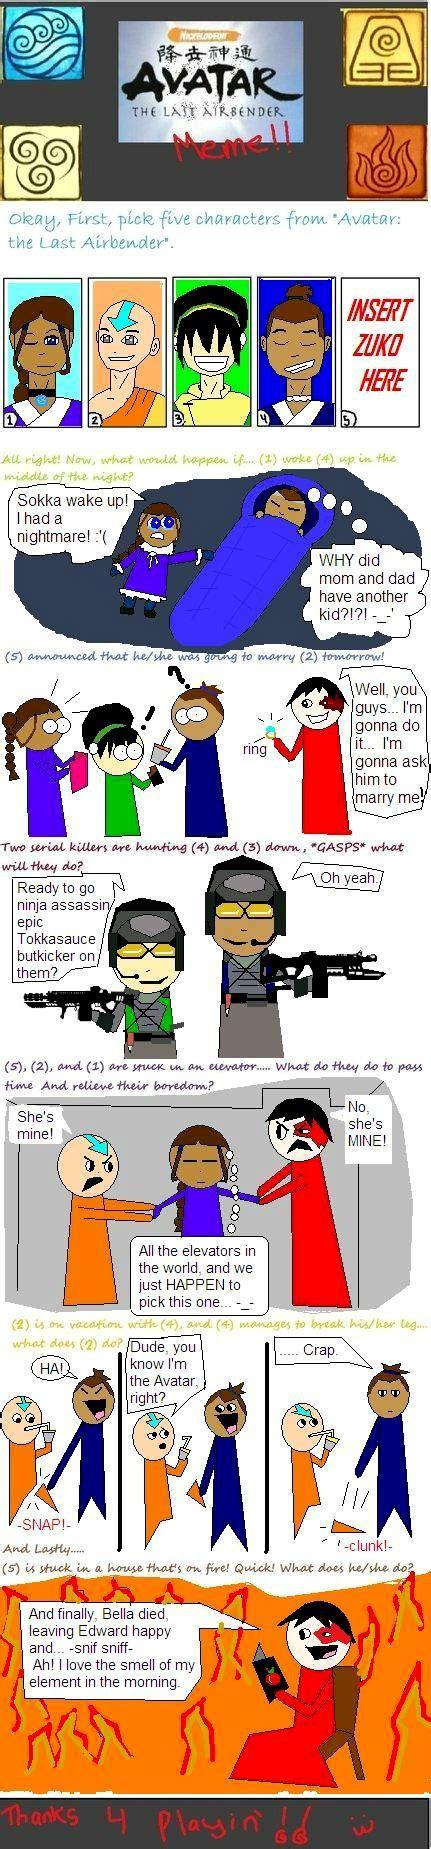 Avatar The Last Airbender Memes - avatar last airbender meme by katara7 on deviantart